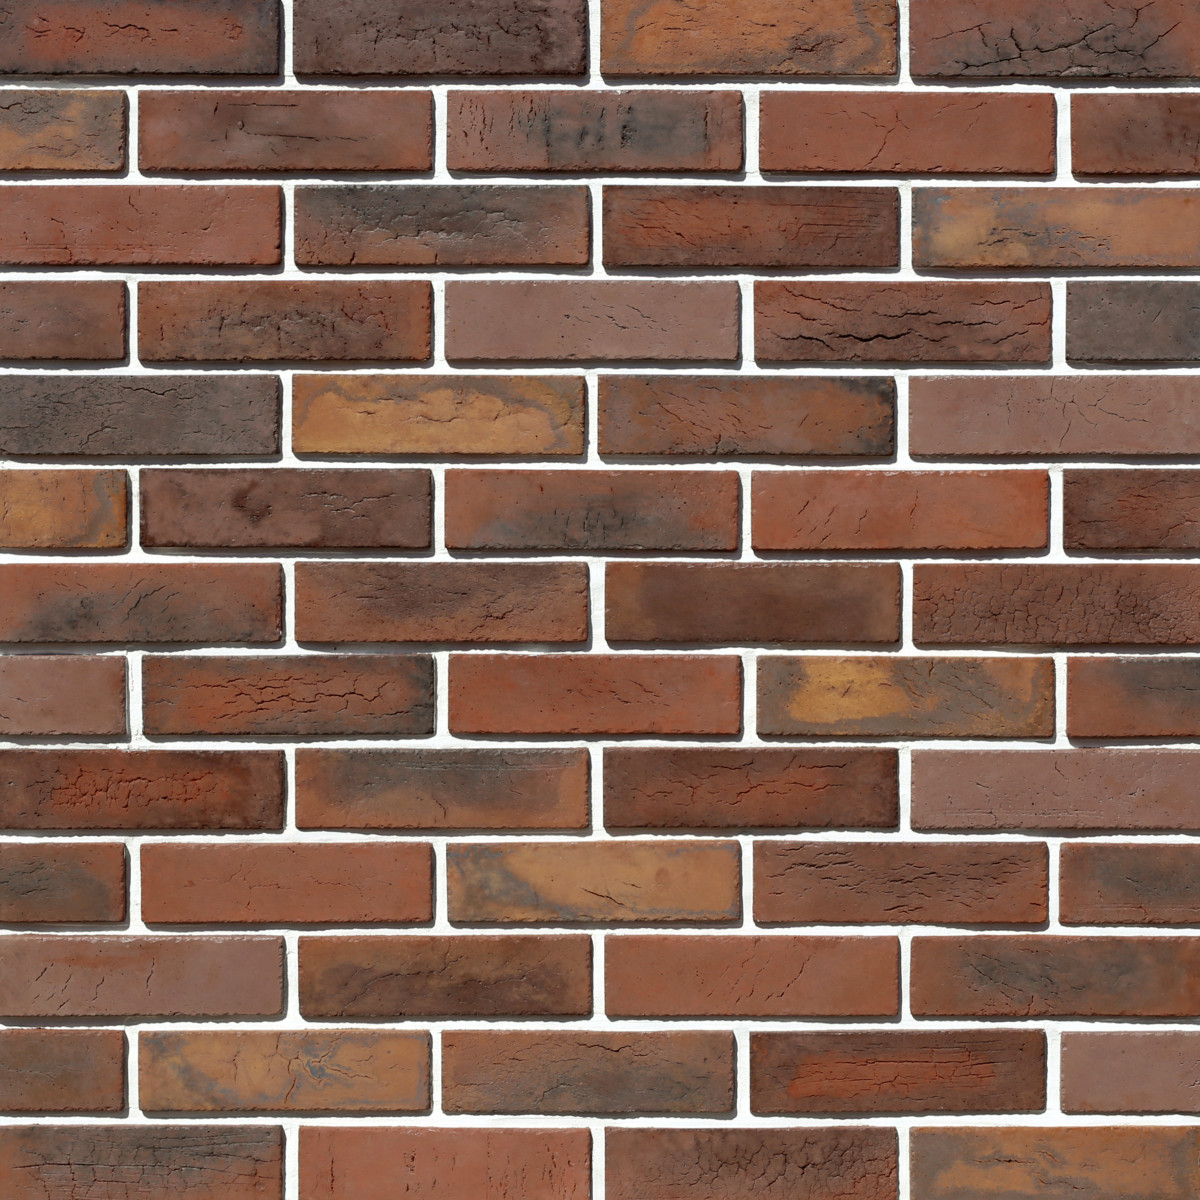 Плитка декоративная Терамо Брик II цвет махагон коричневый 1.34 м²